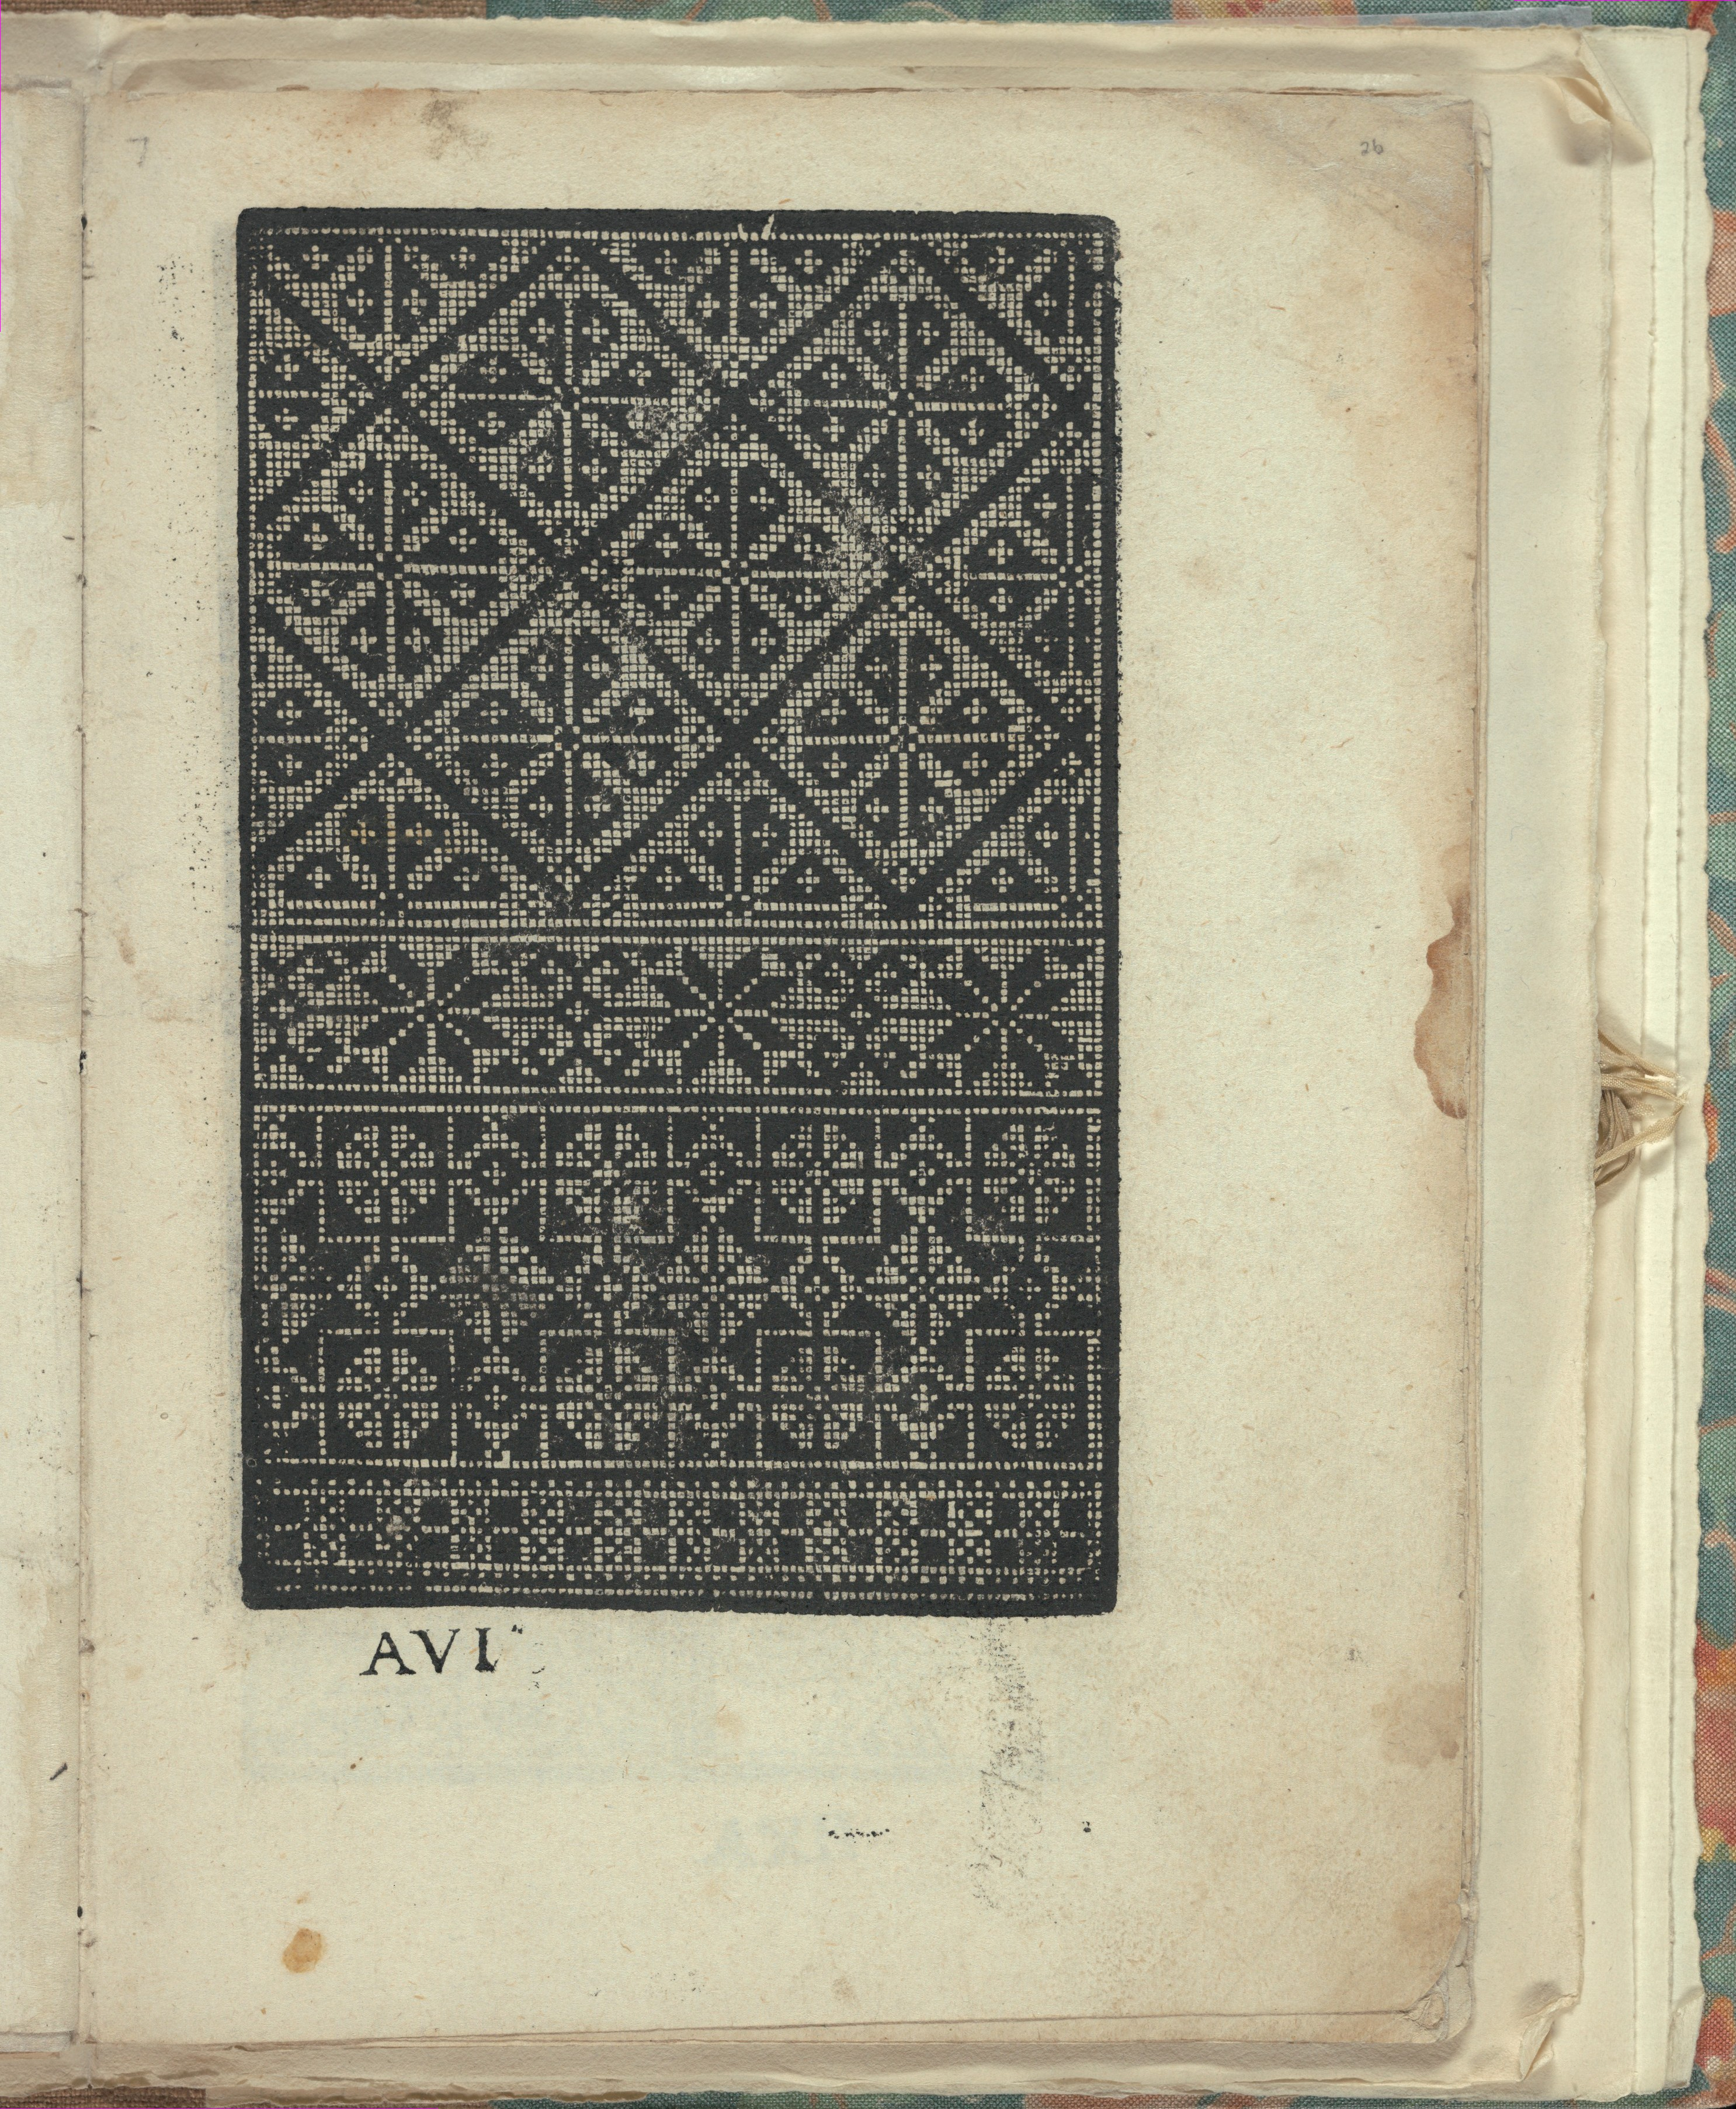 File:Opera Nova Universali inulata Corona di racammi, page 26 ... on